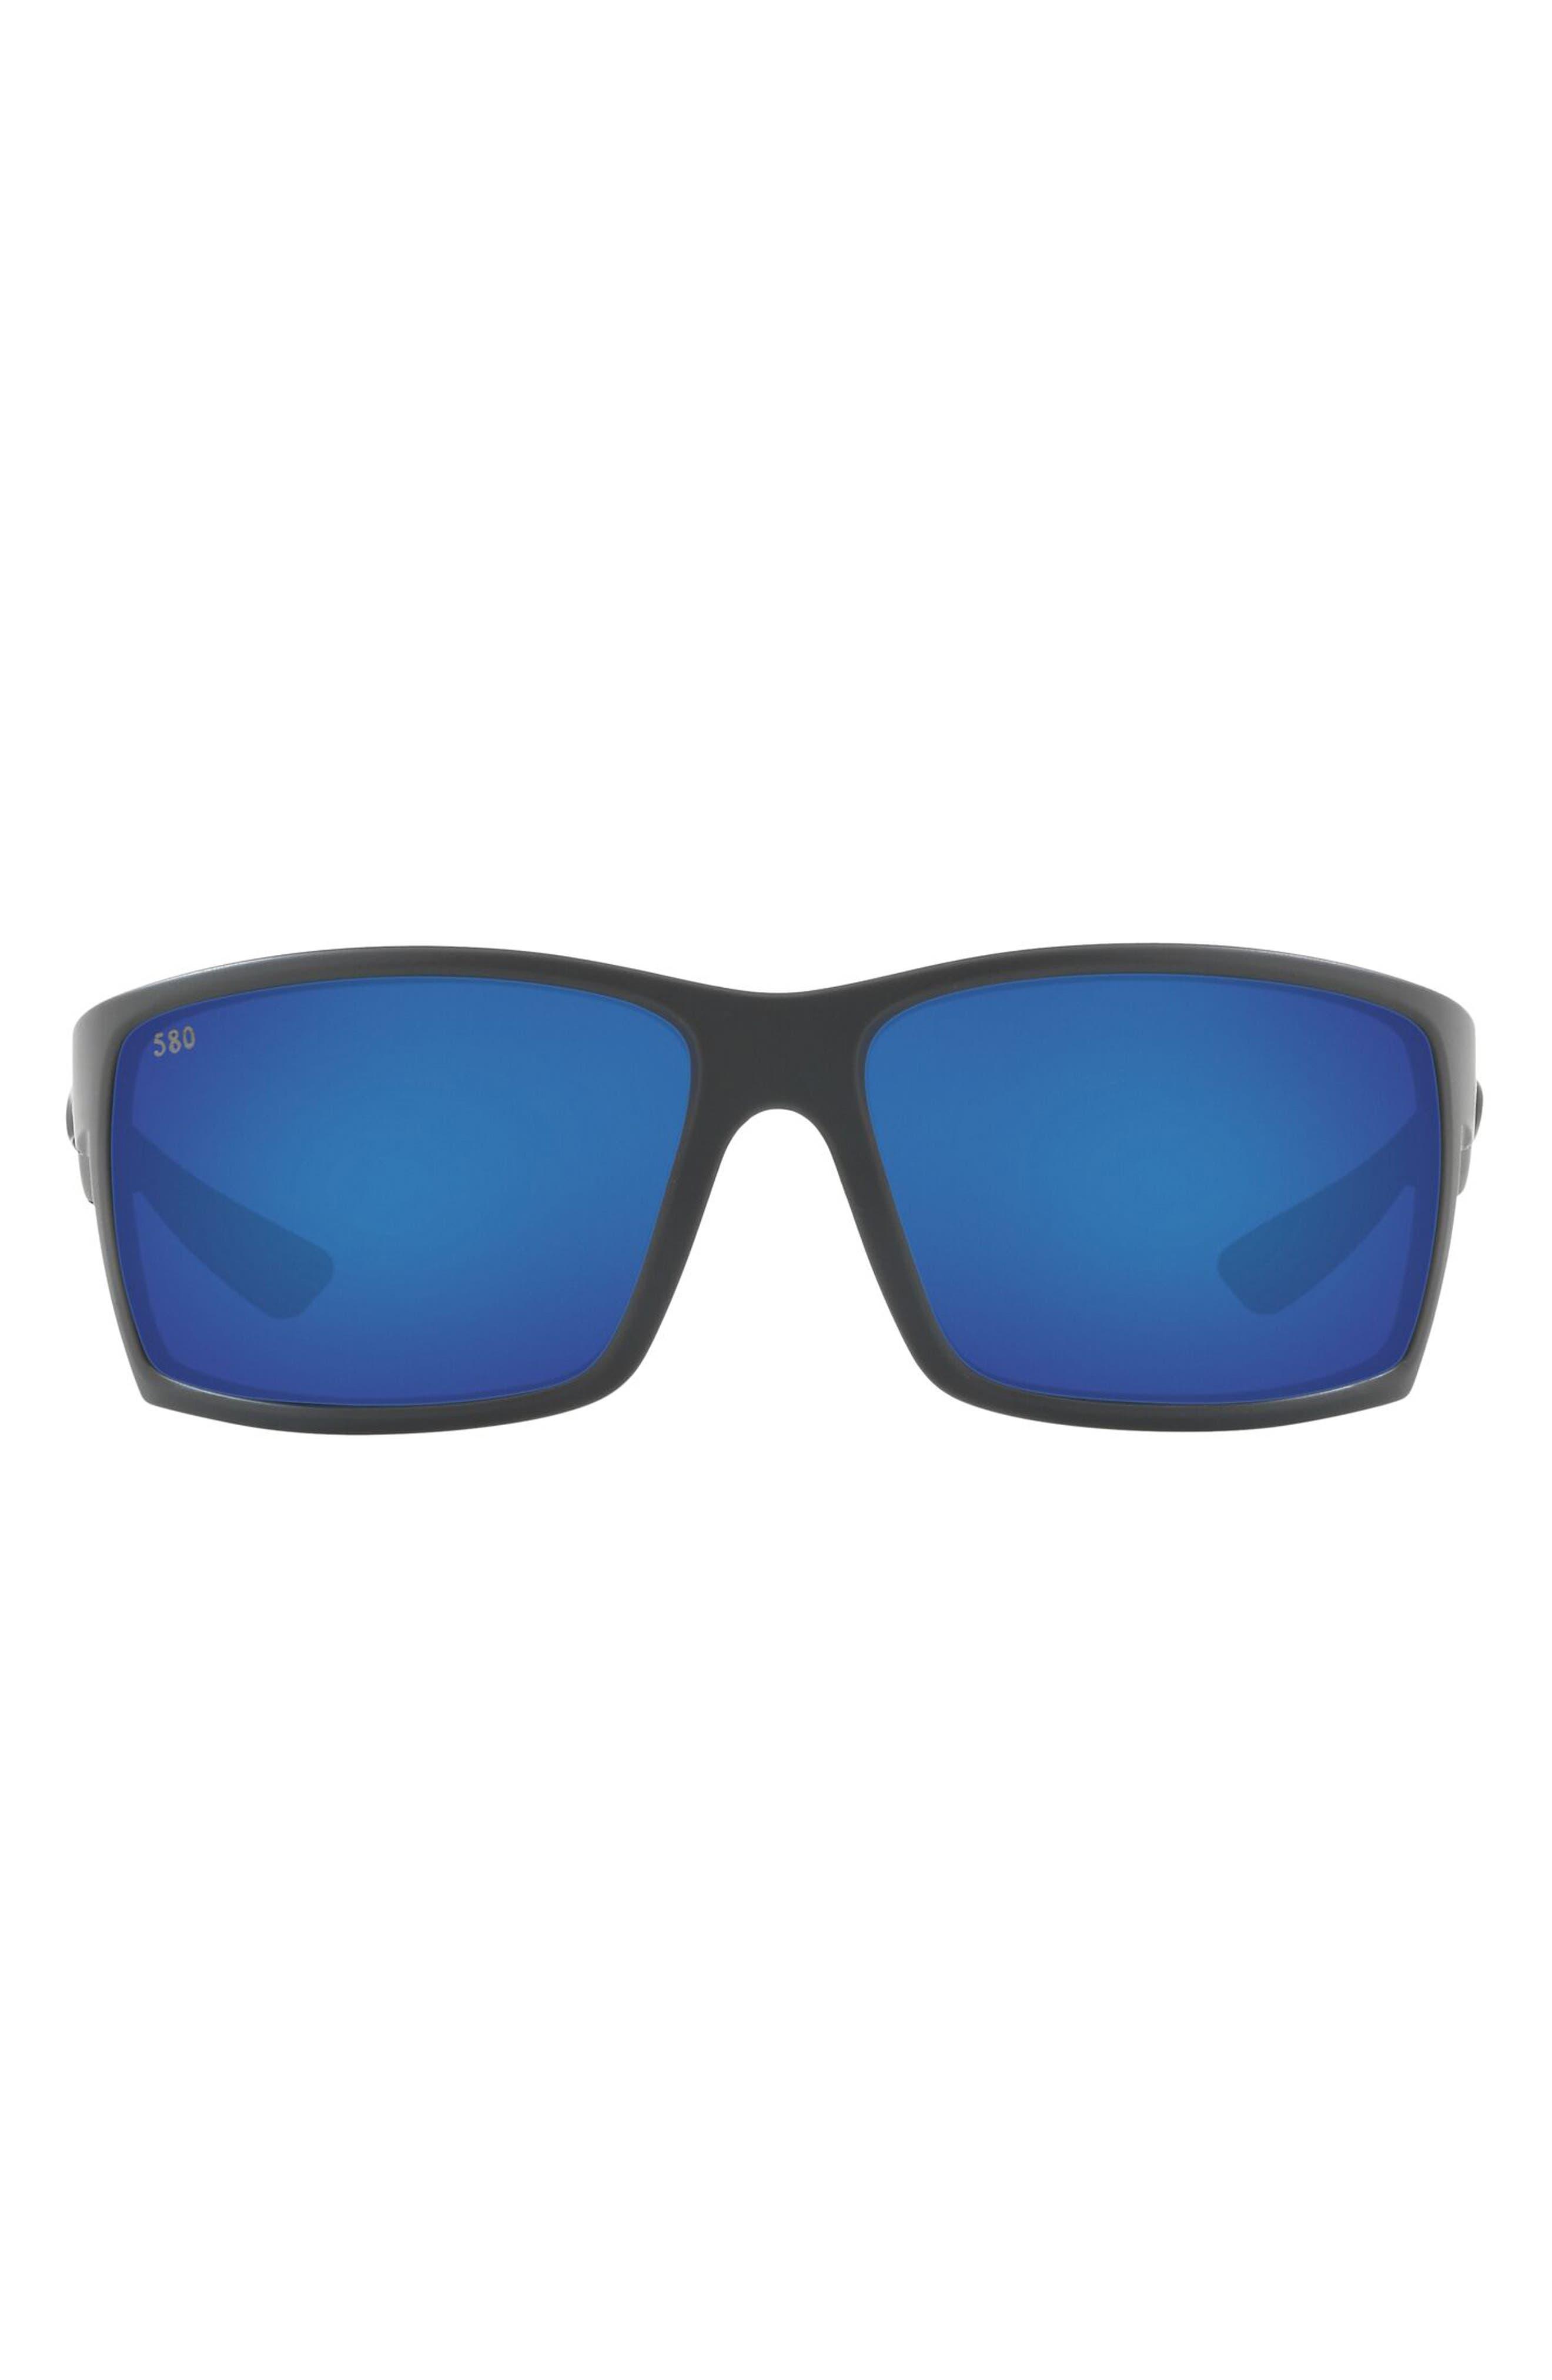 64mm Mirrored Polarized Oversize Rectangle Sunglasses